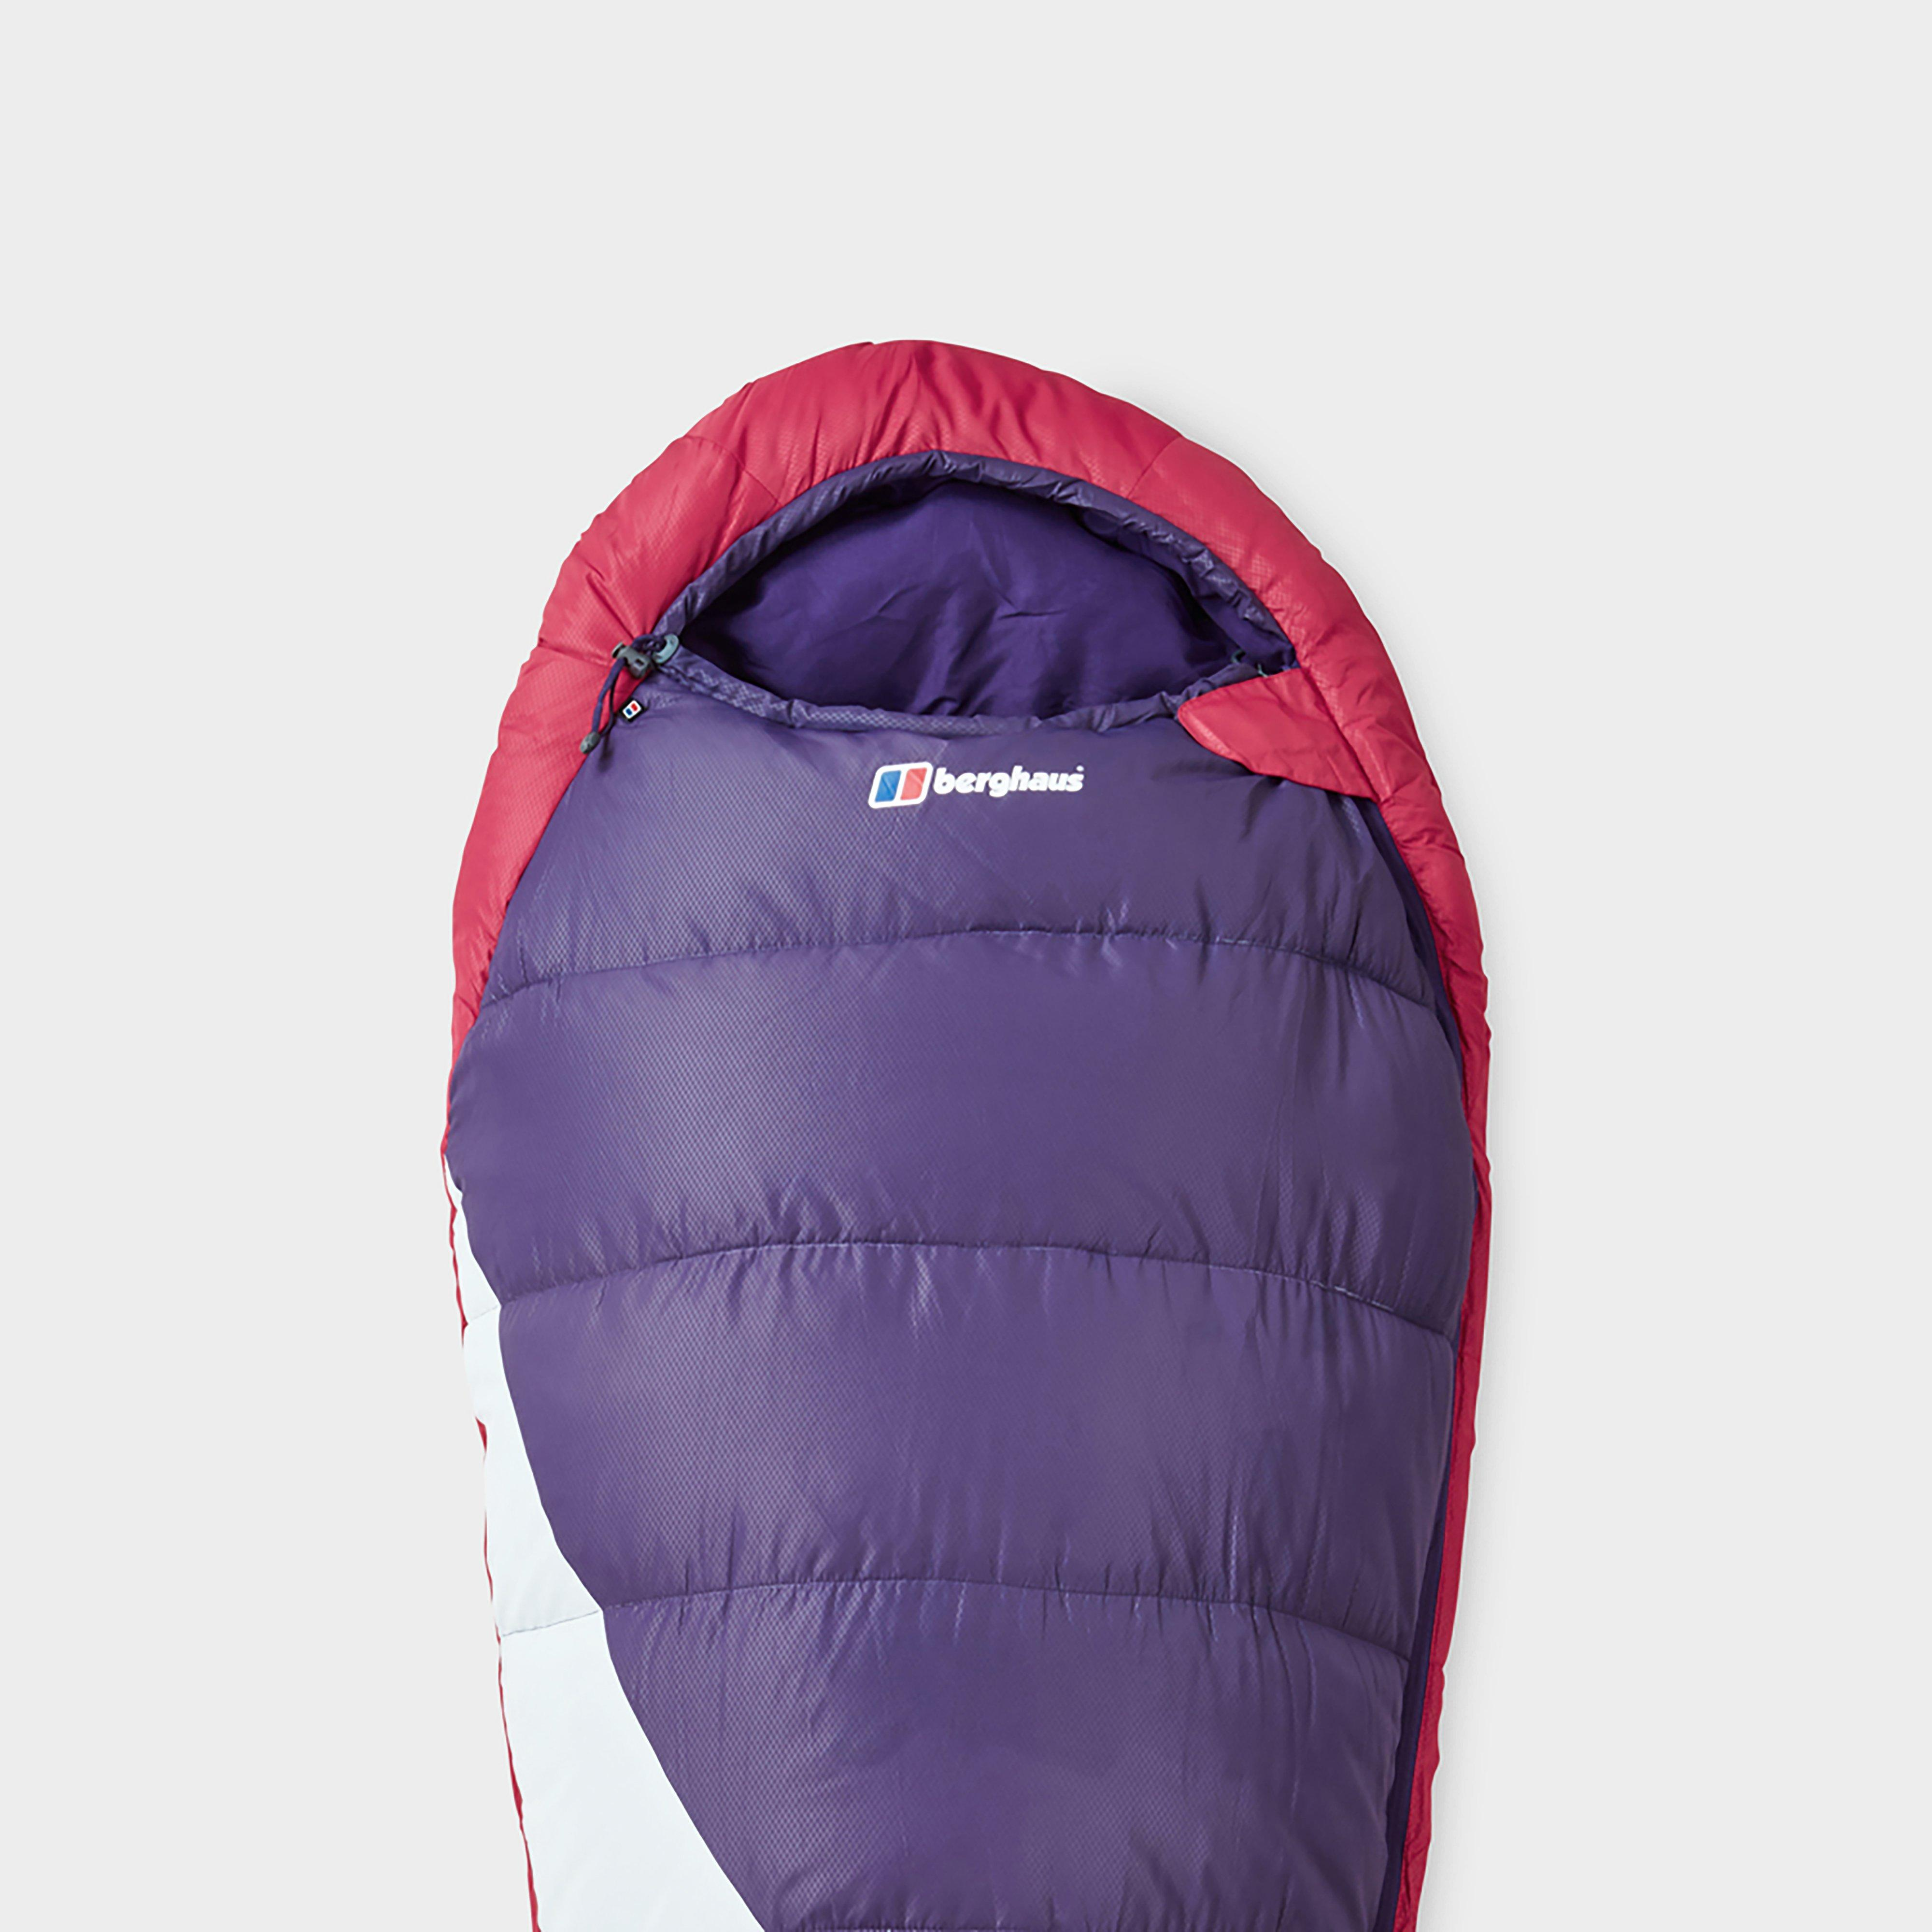 Berghaus Womens Transition 200w Sleeping Bag - Purple/pink  Purple/pink